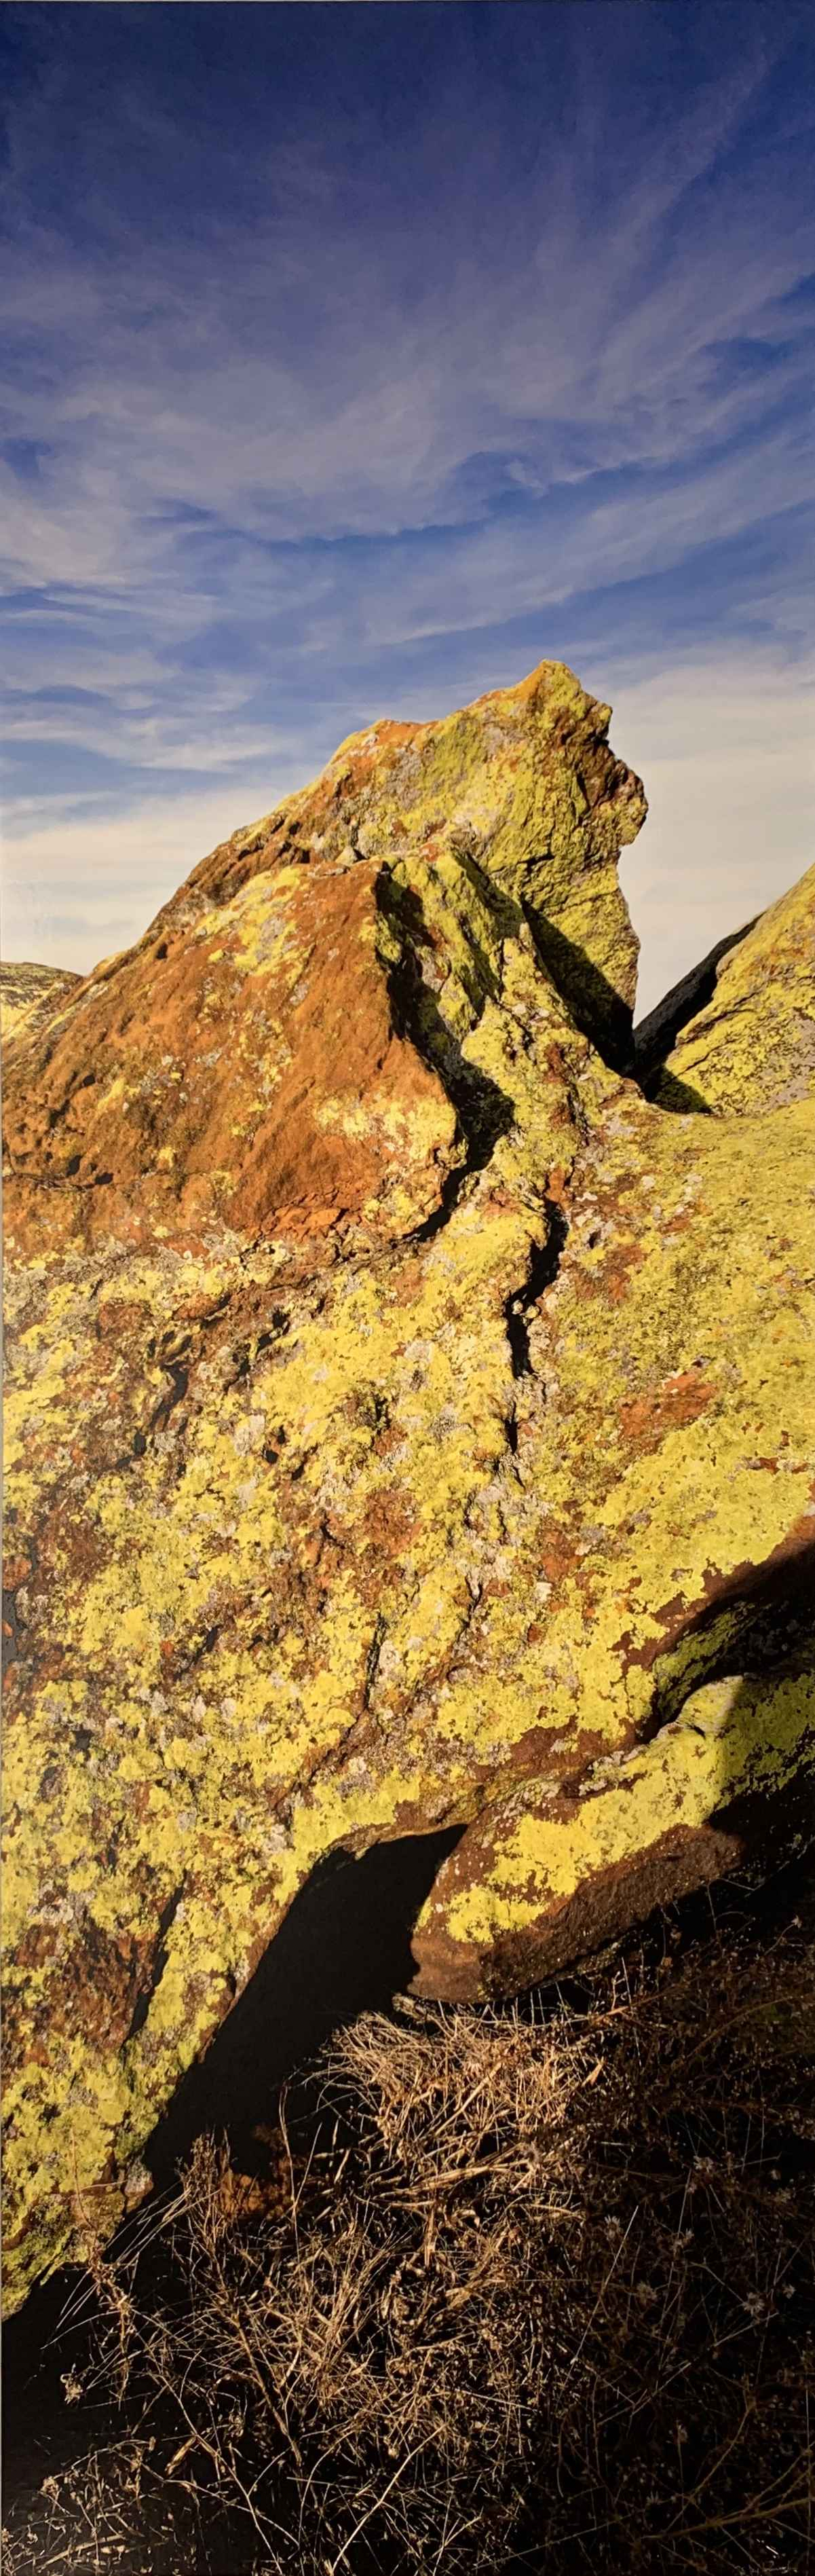 Lichen, Stone, Sky, O... by  George Jerkovich - Masterpiece Online